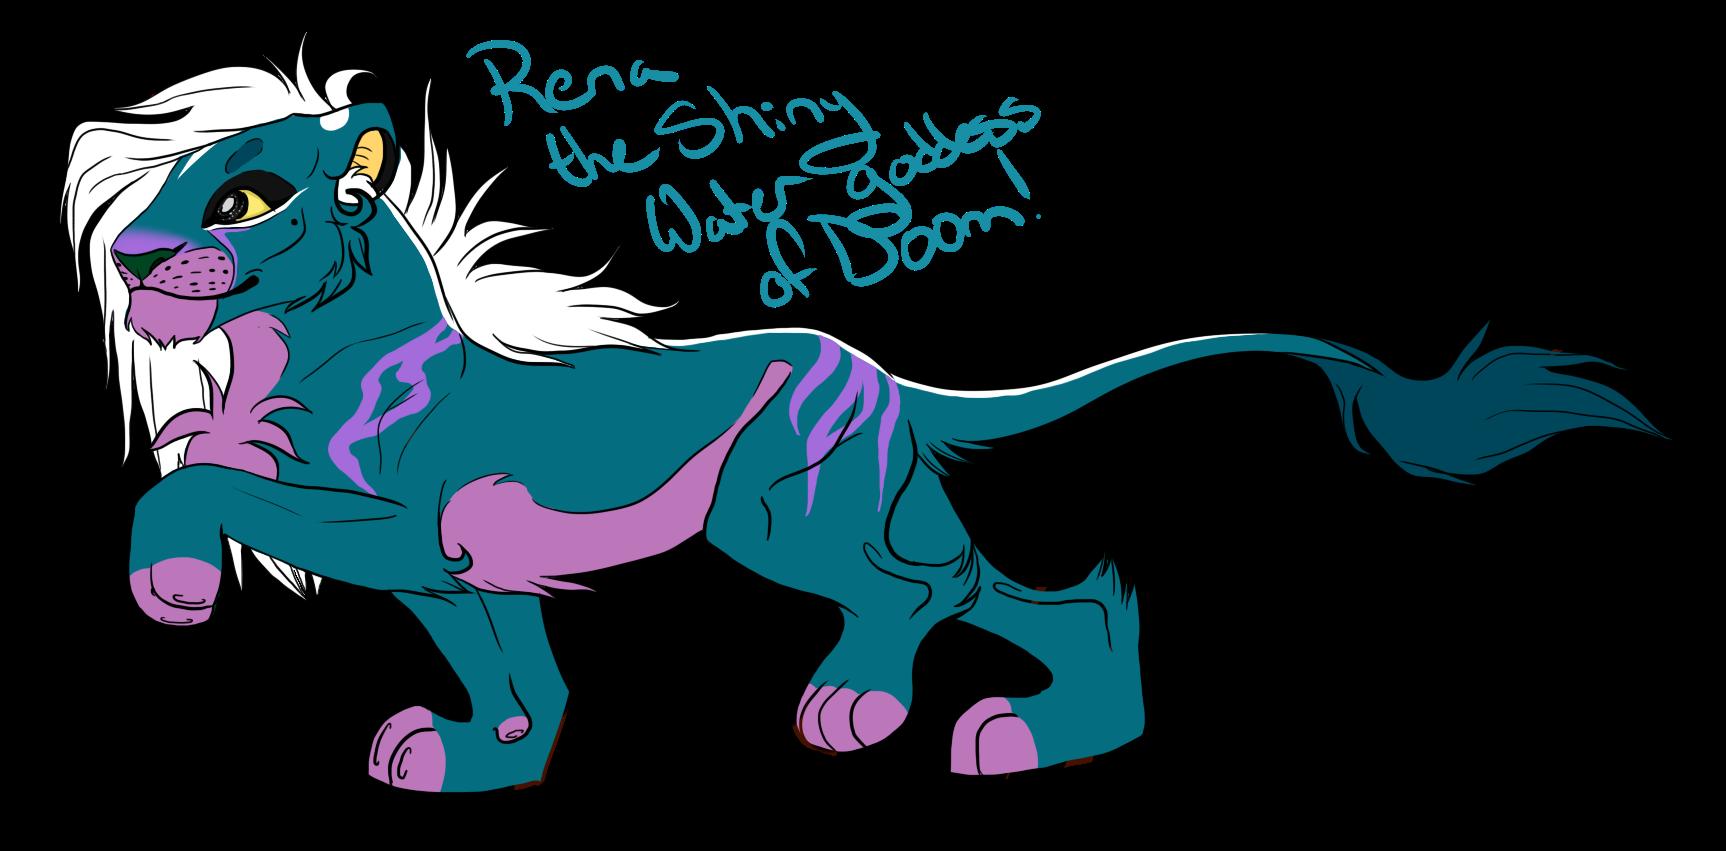 Rena the Shiny Water Goddess of Doom! by IzzyShea